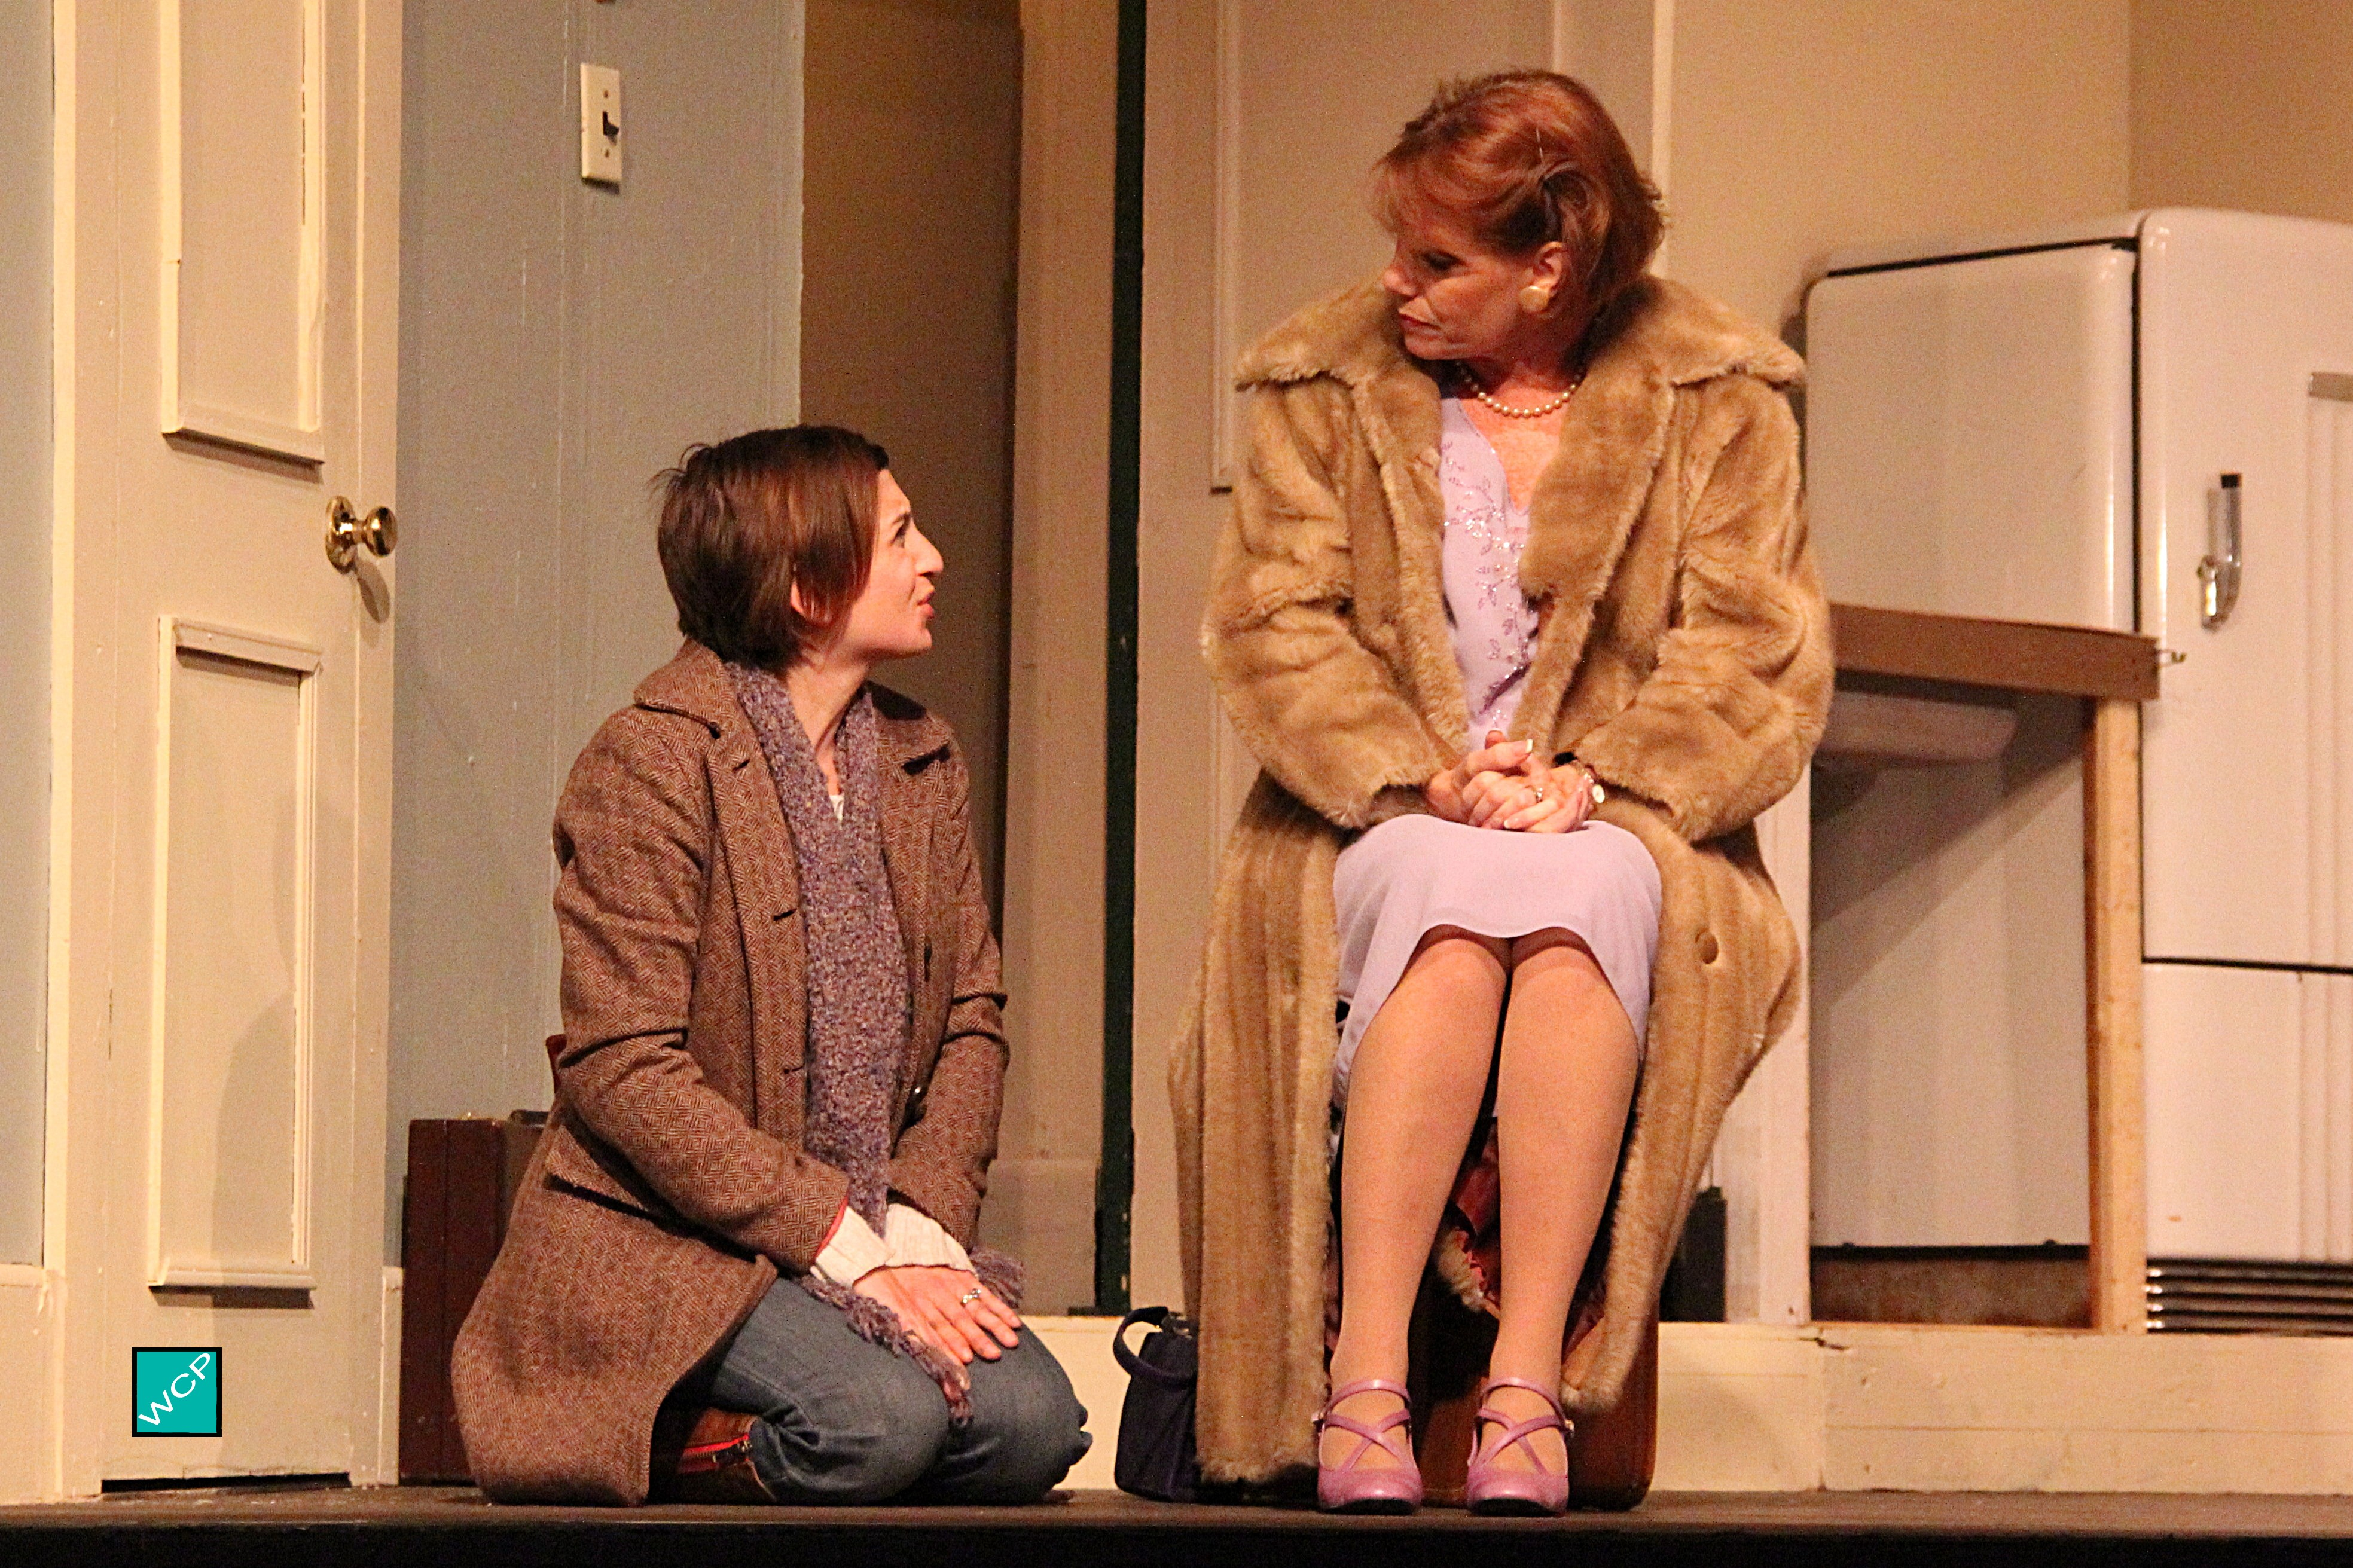 Debbie Campanali as Corie, Zita Geoffroy-Heinz as Mrs. Banks